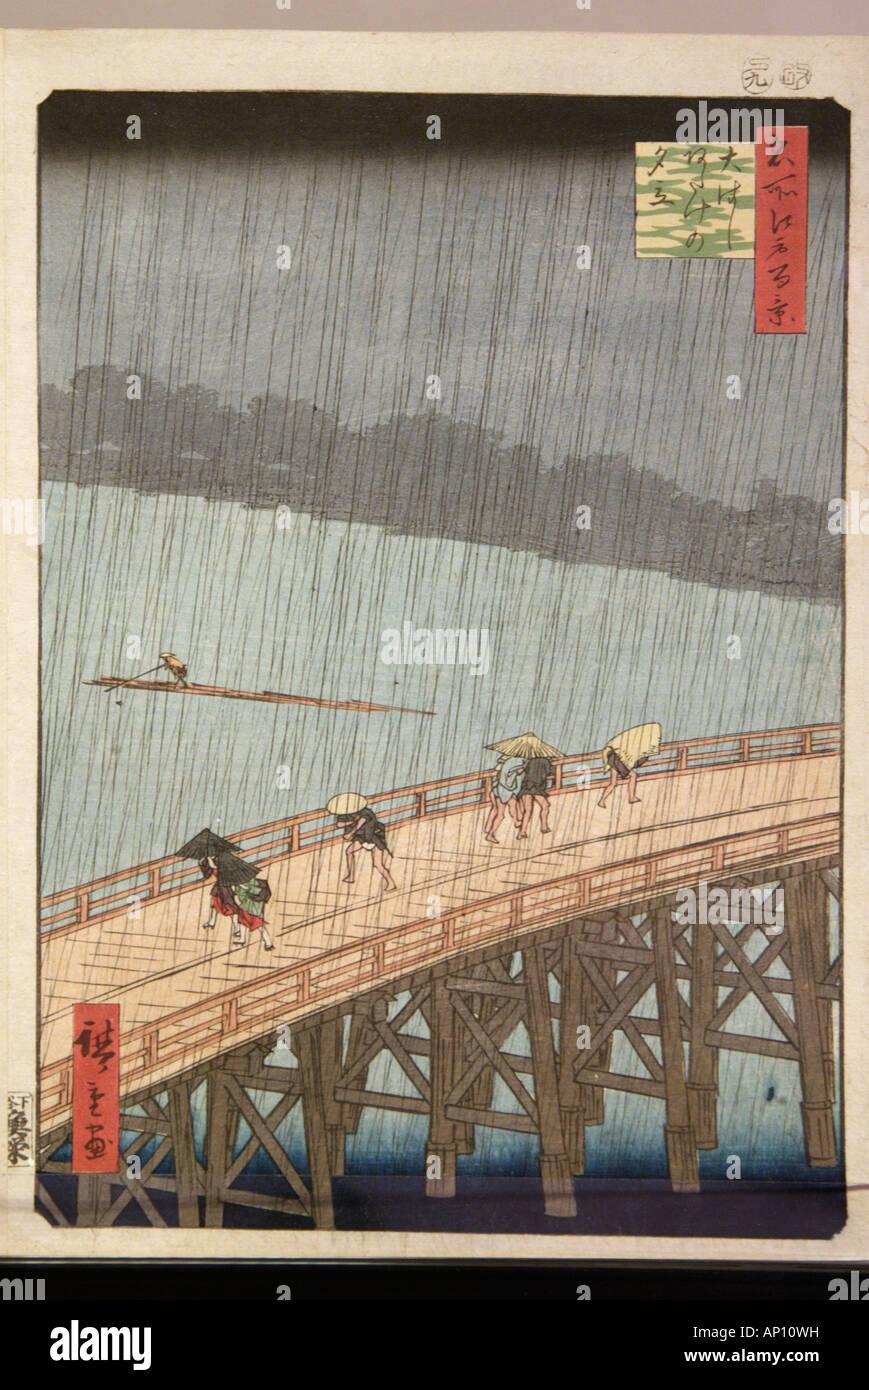 Japanese Ukiyo e print Japan Japanese crossing bamboo wood wooden bridge rain downpour shower wet deluge river cross - Stock Image